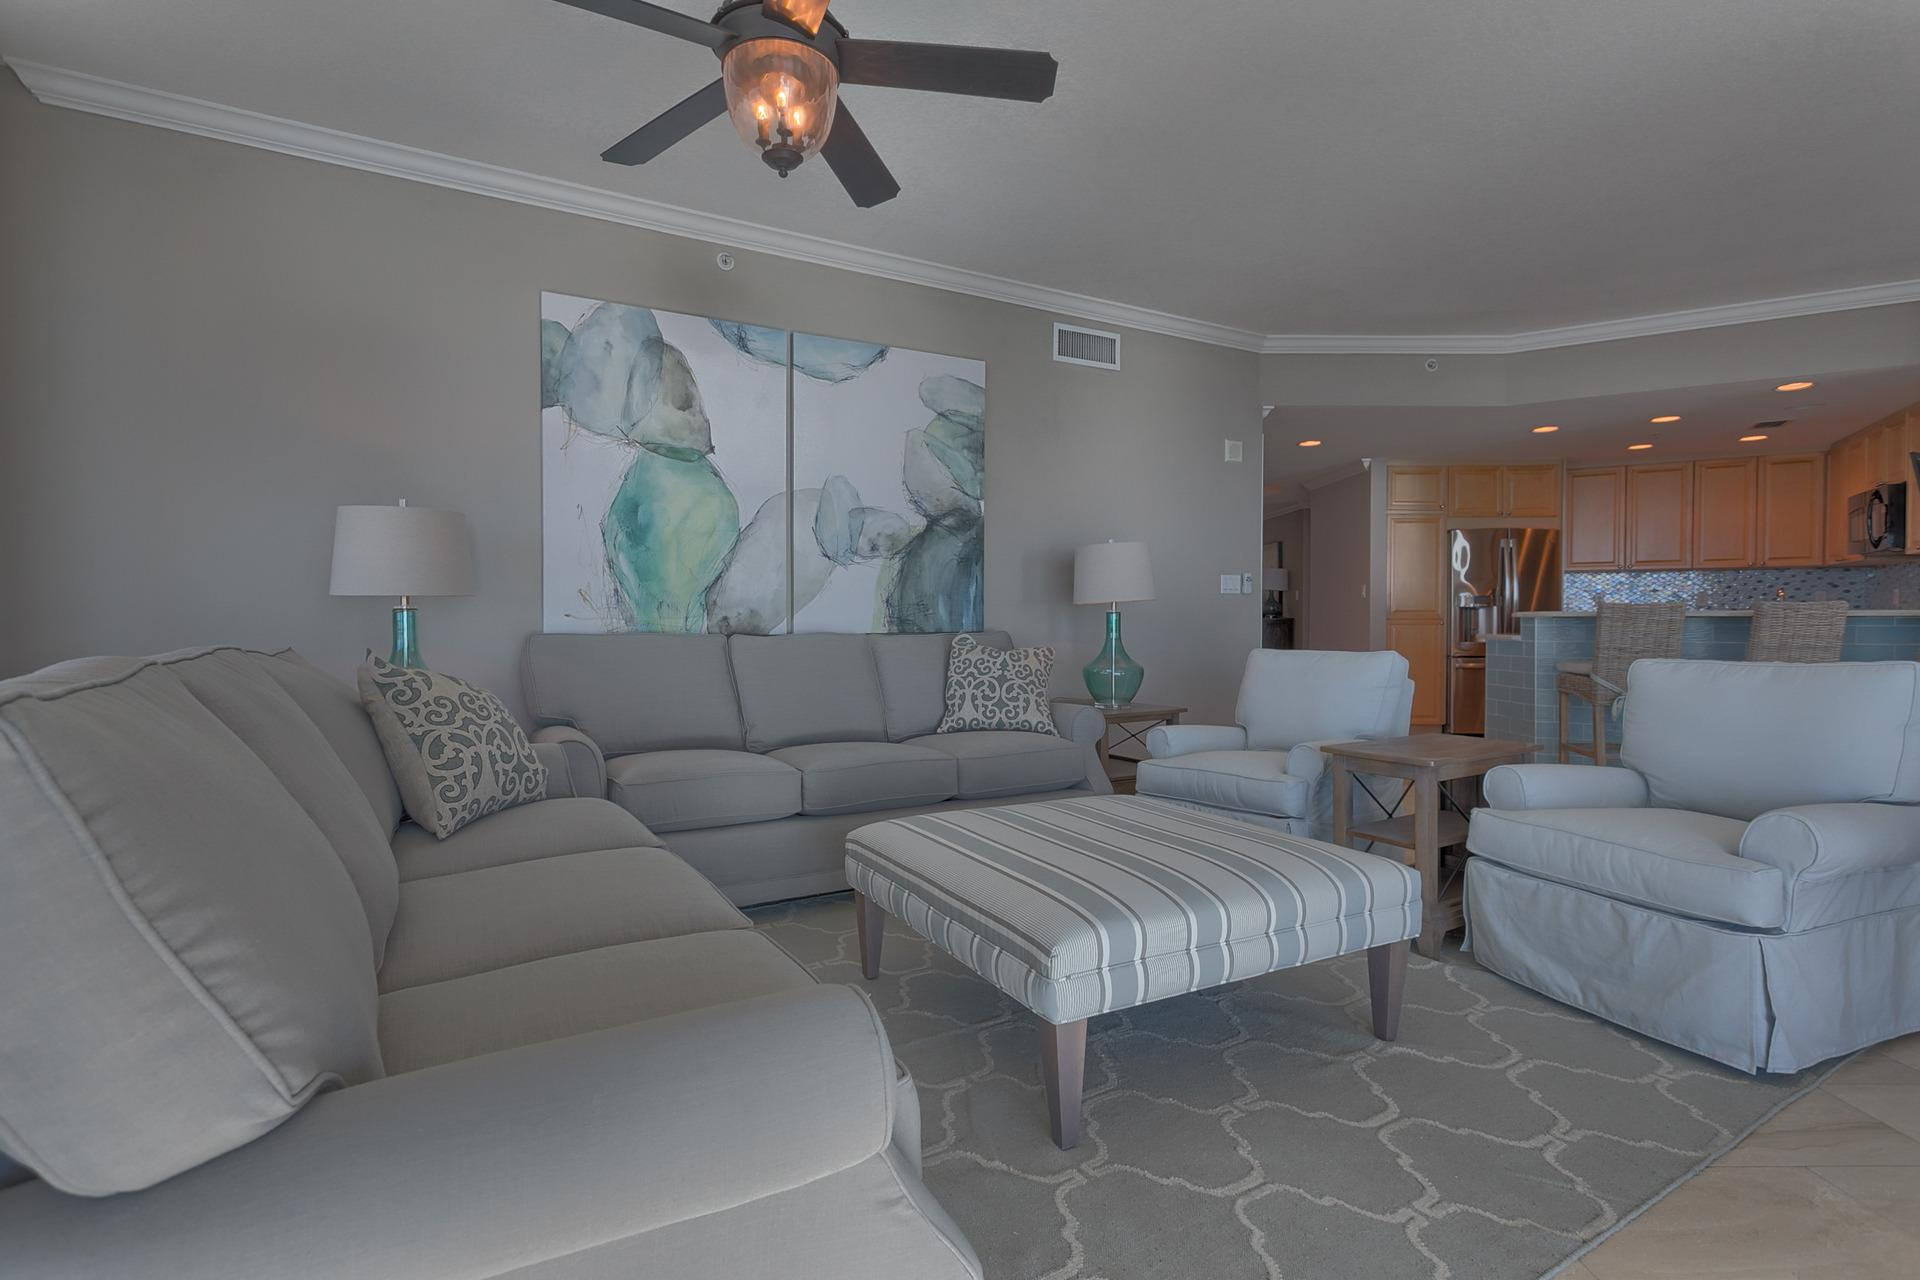 J Millers Furniture In Gulf Breeze Fl Whitepages